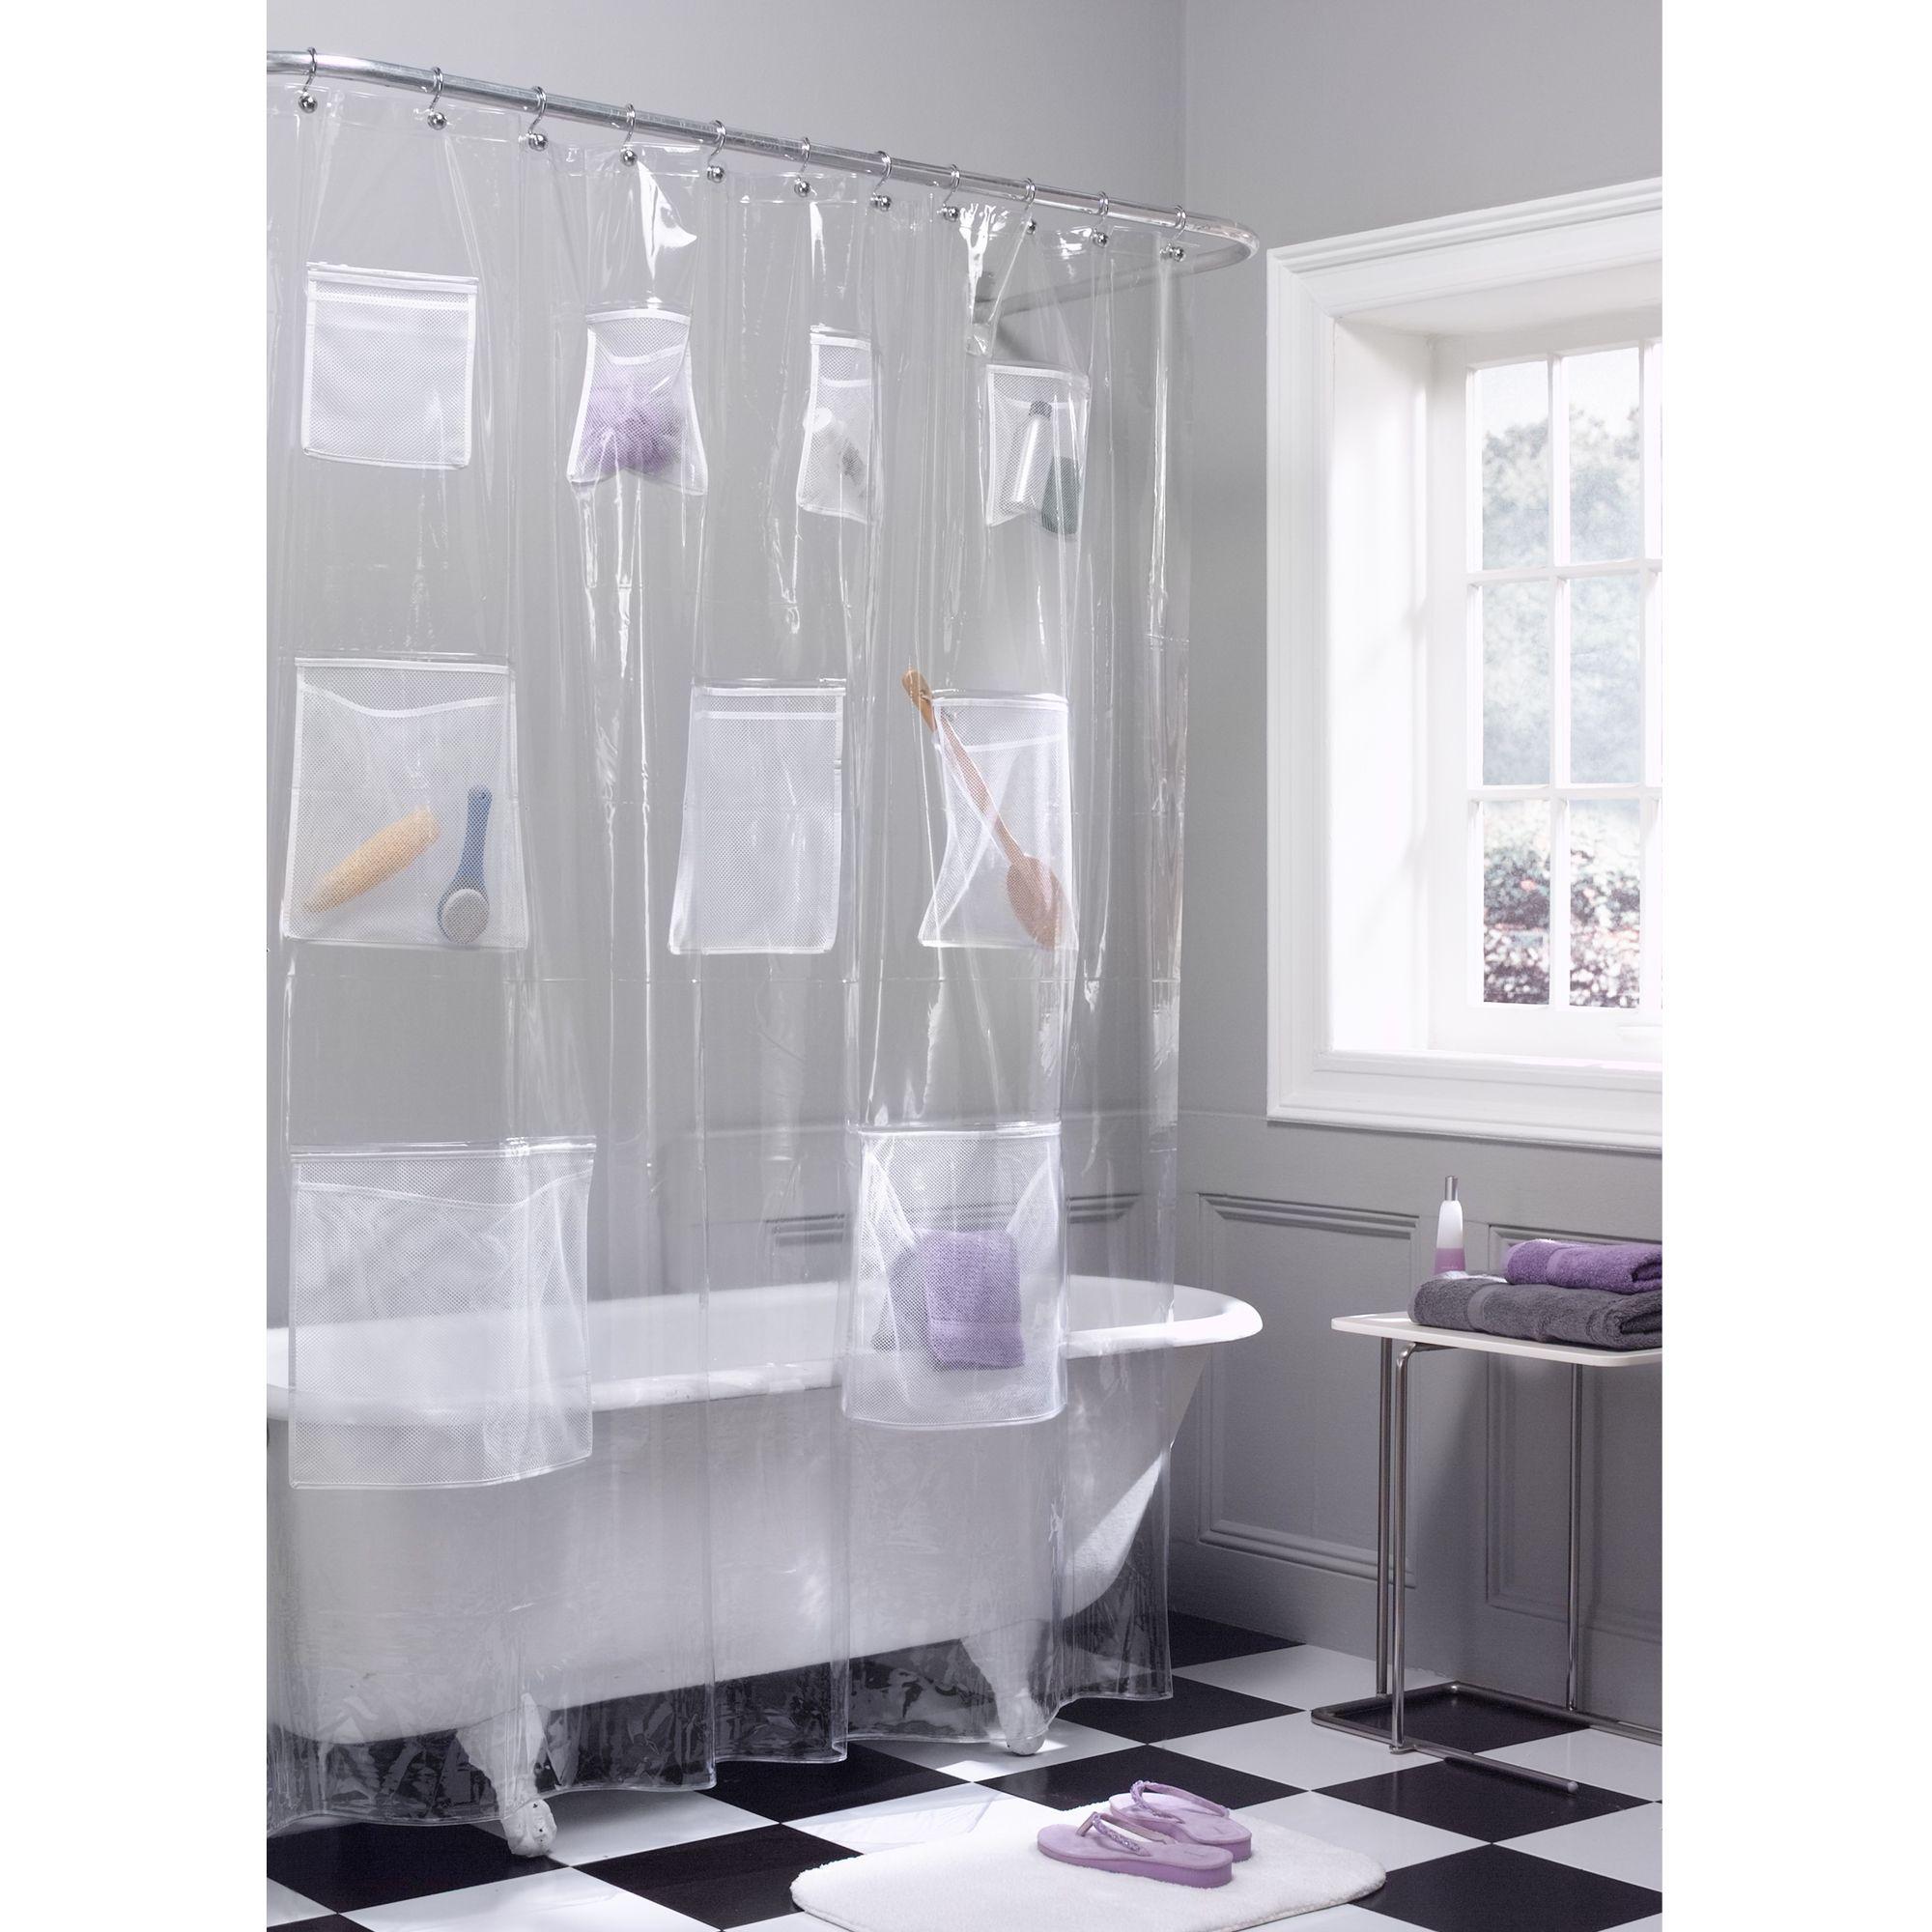 Home Vinyl Shower Curtains Kids Shower Curtain Shower Curtains